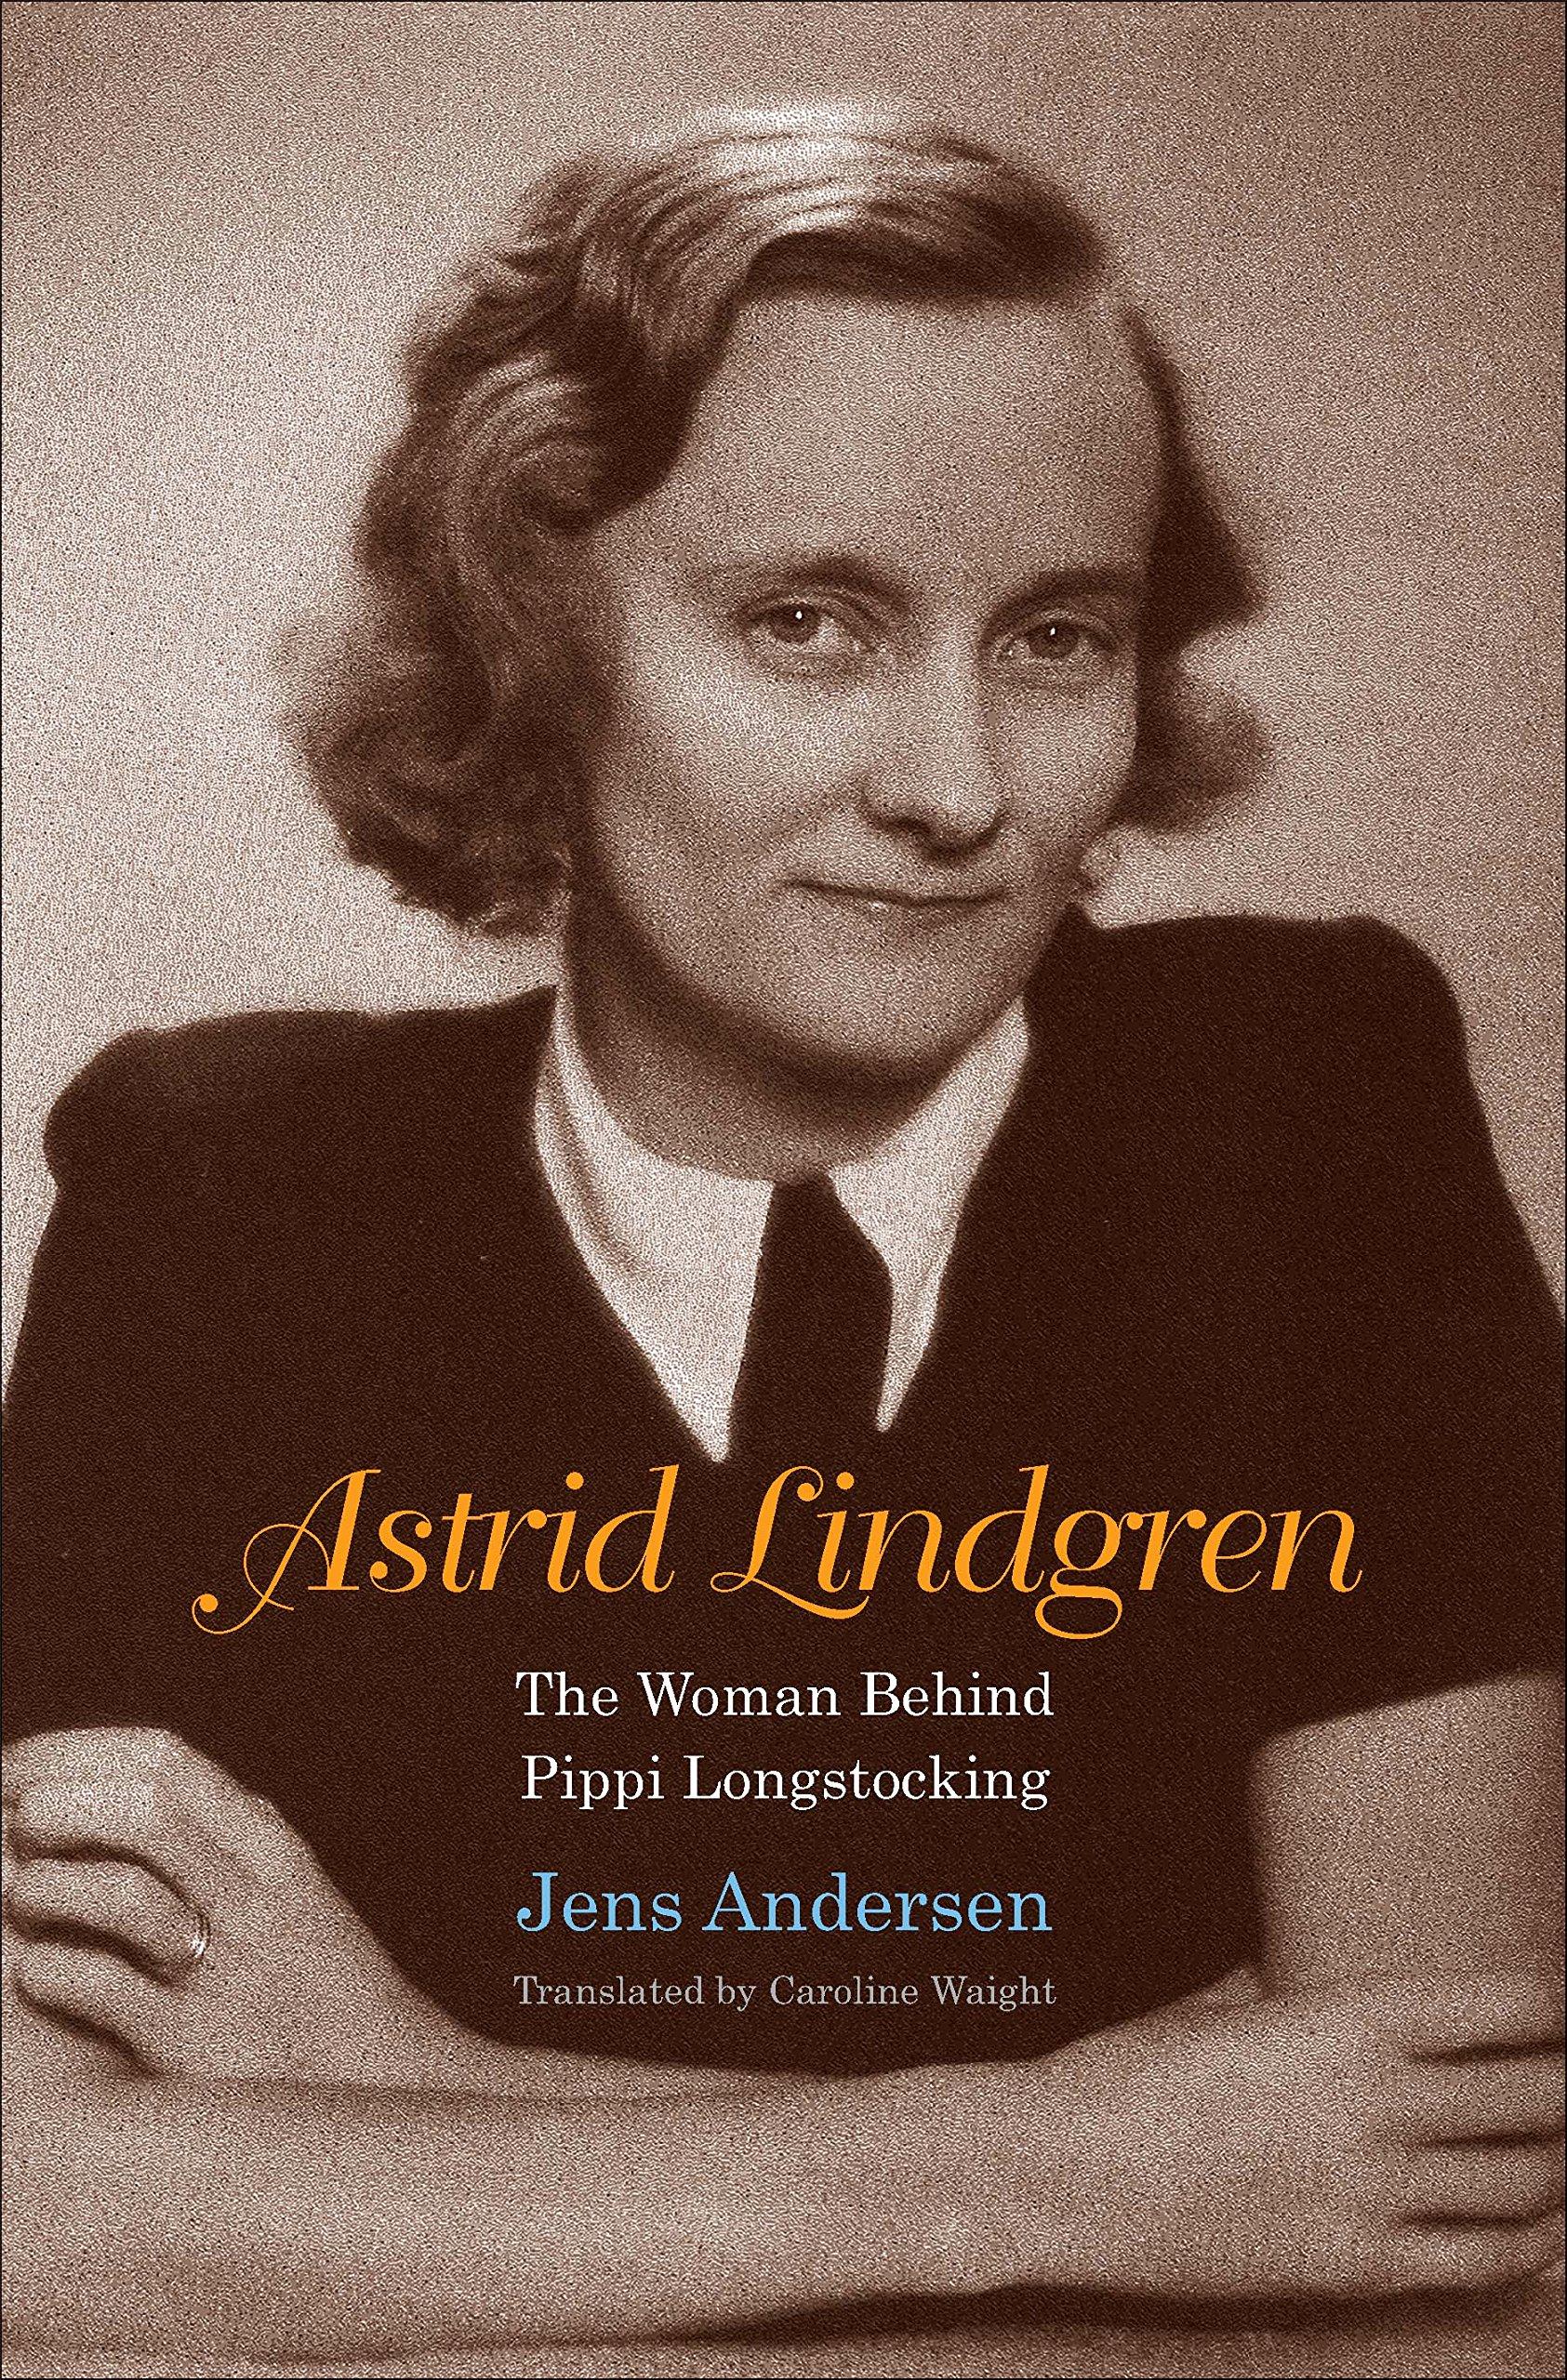 Astrid Lindgren: biography, personal life, books, photos 82